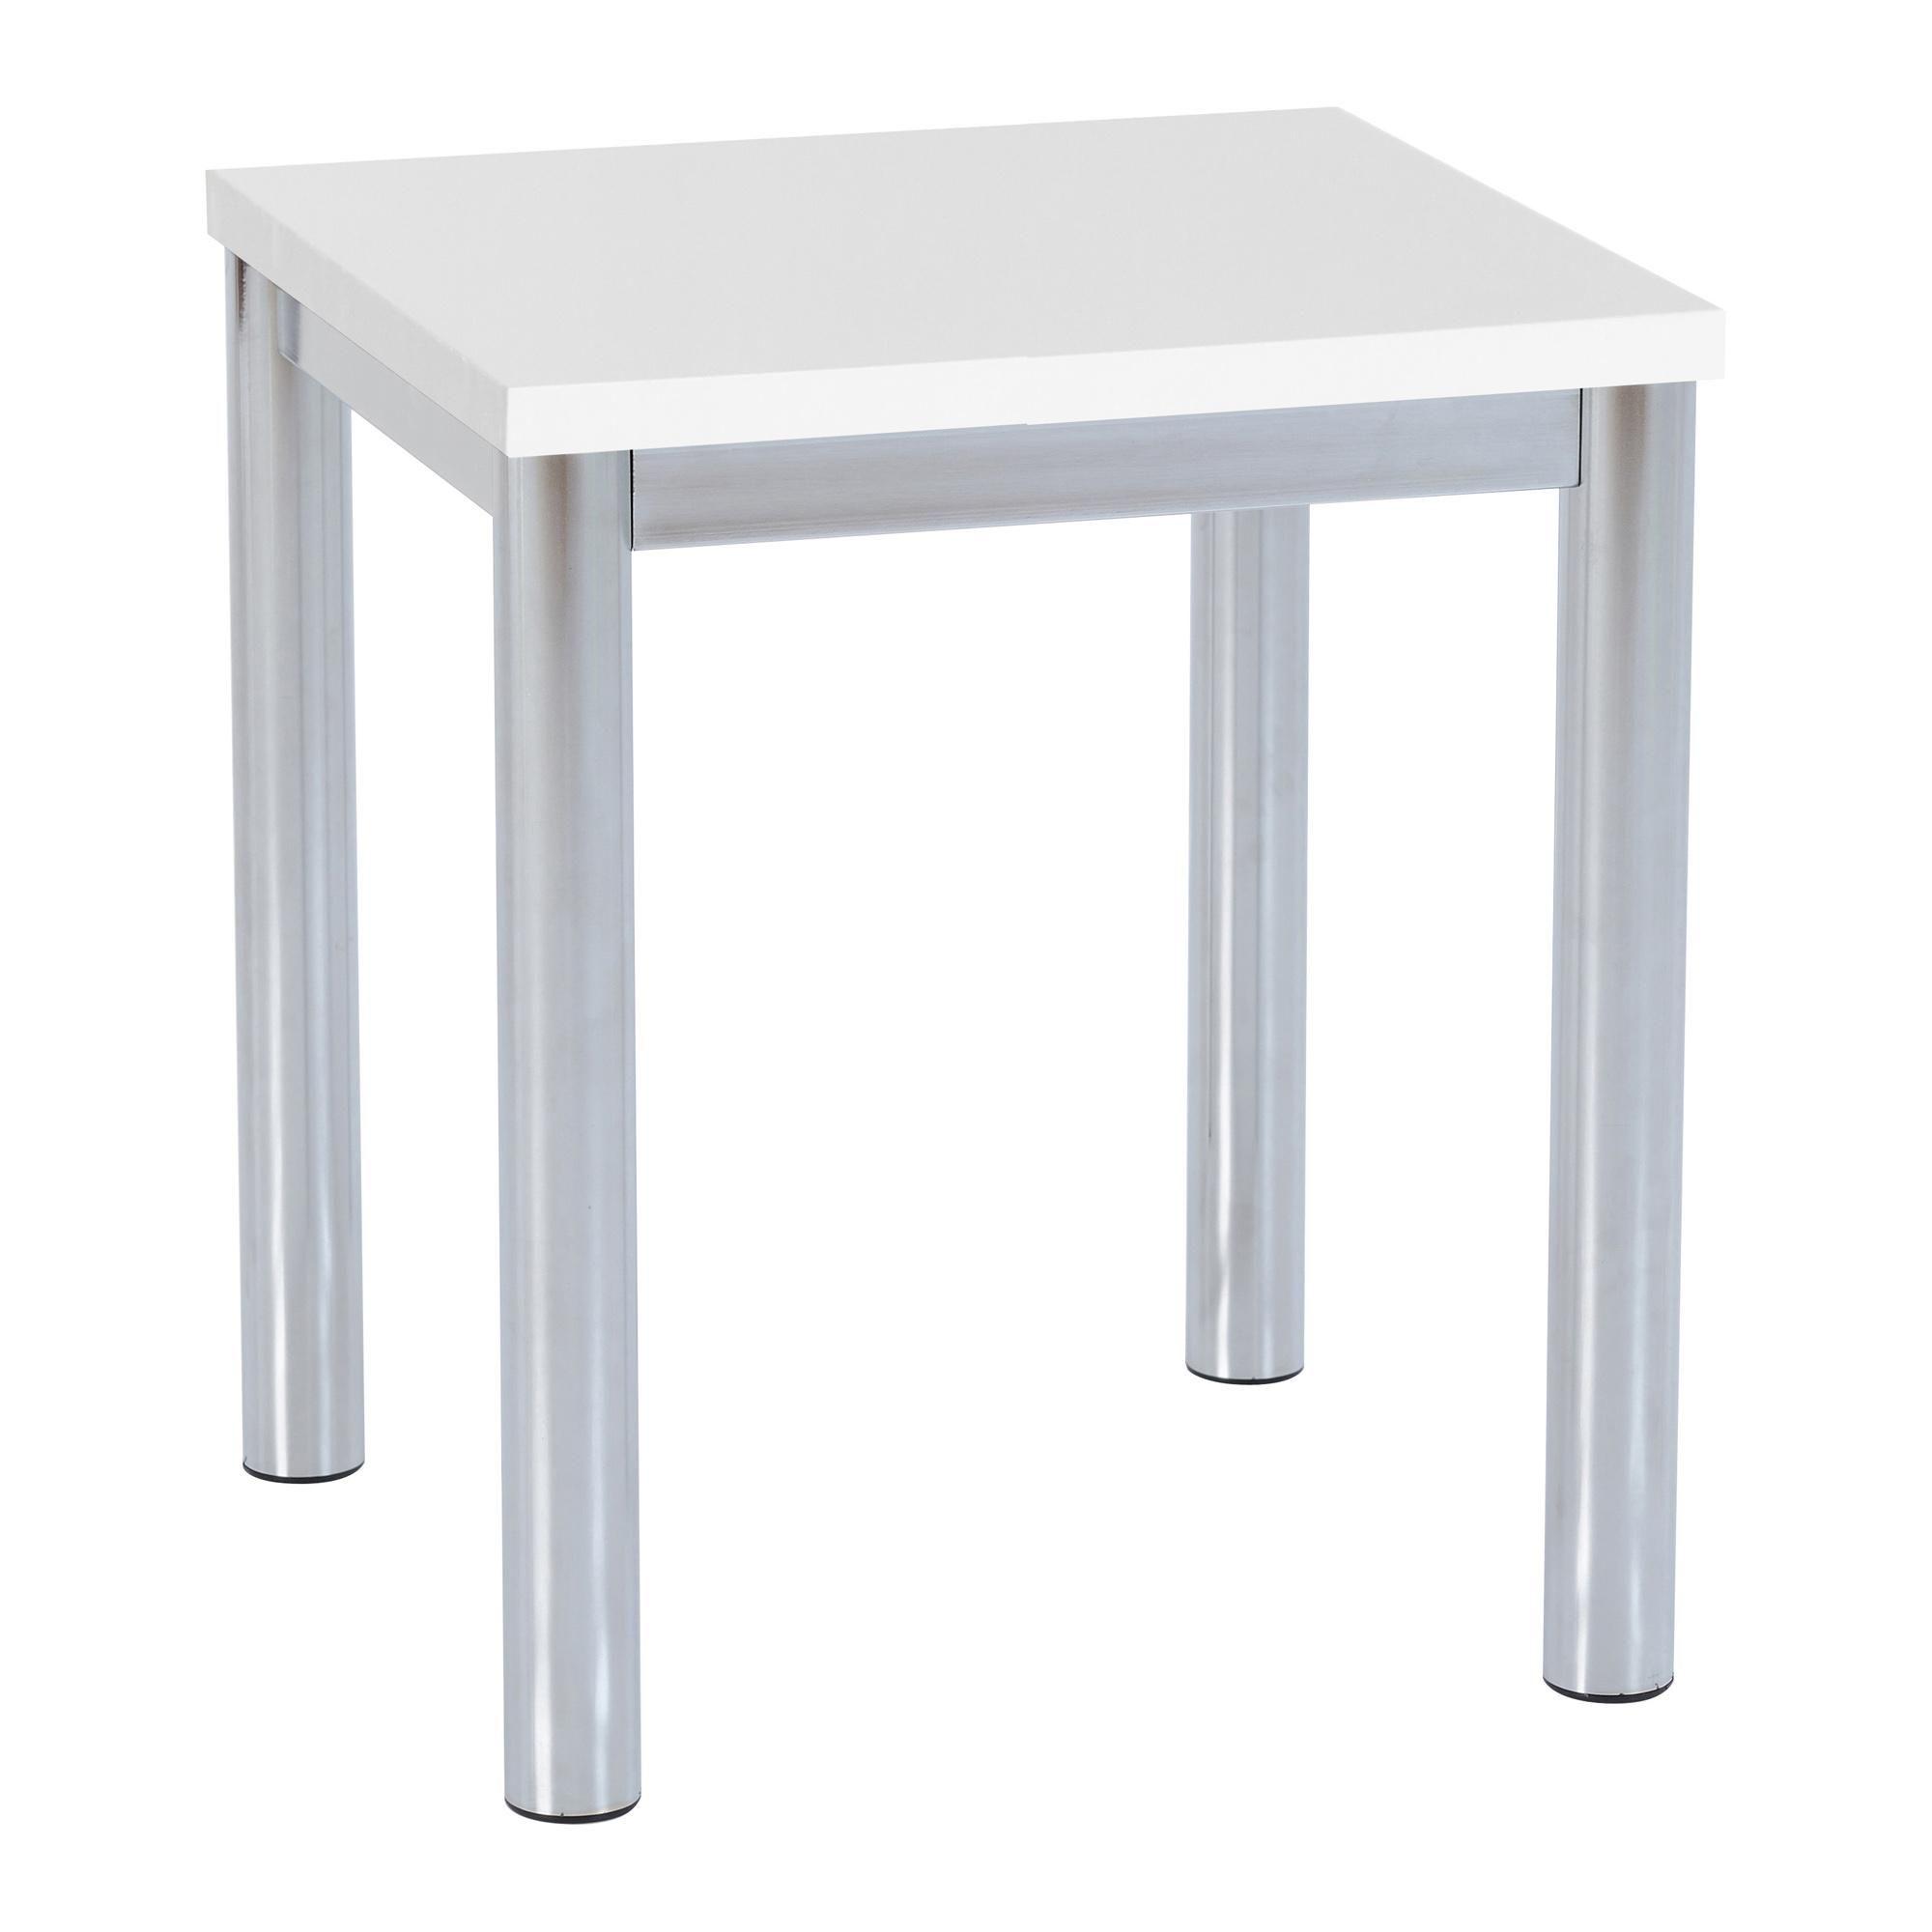 Charisma Side Table In 2020 Minimalist Design Design Table